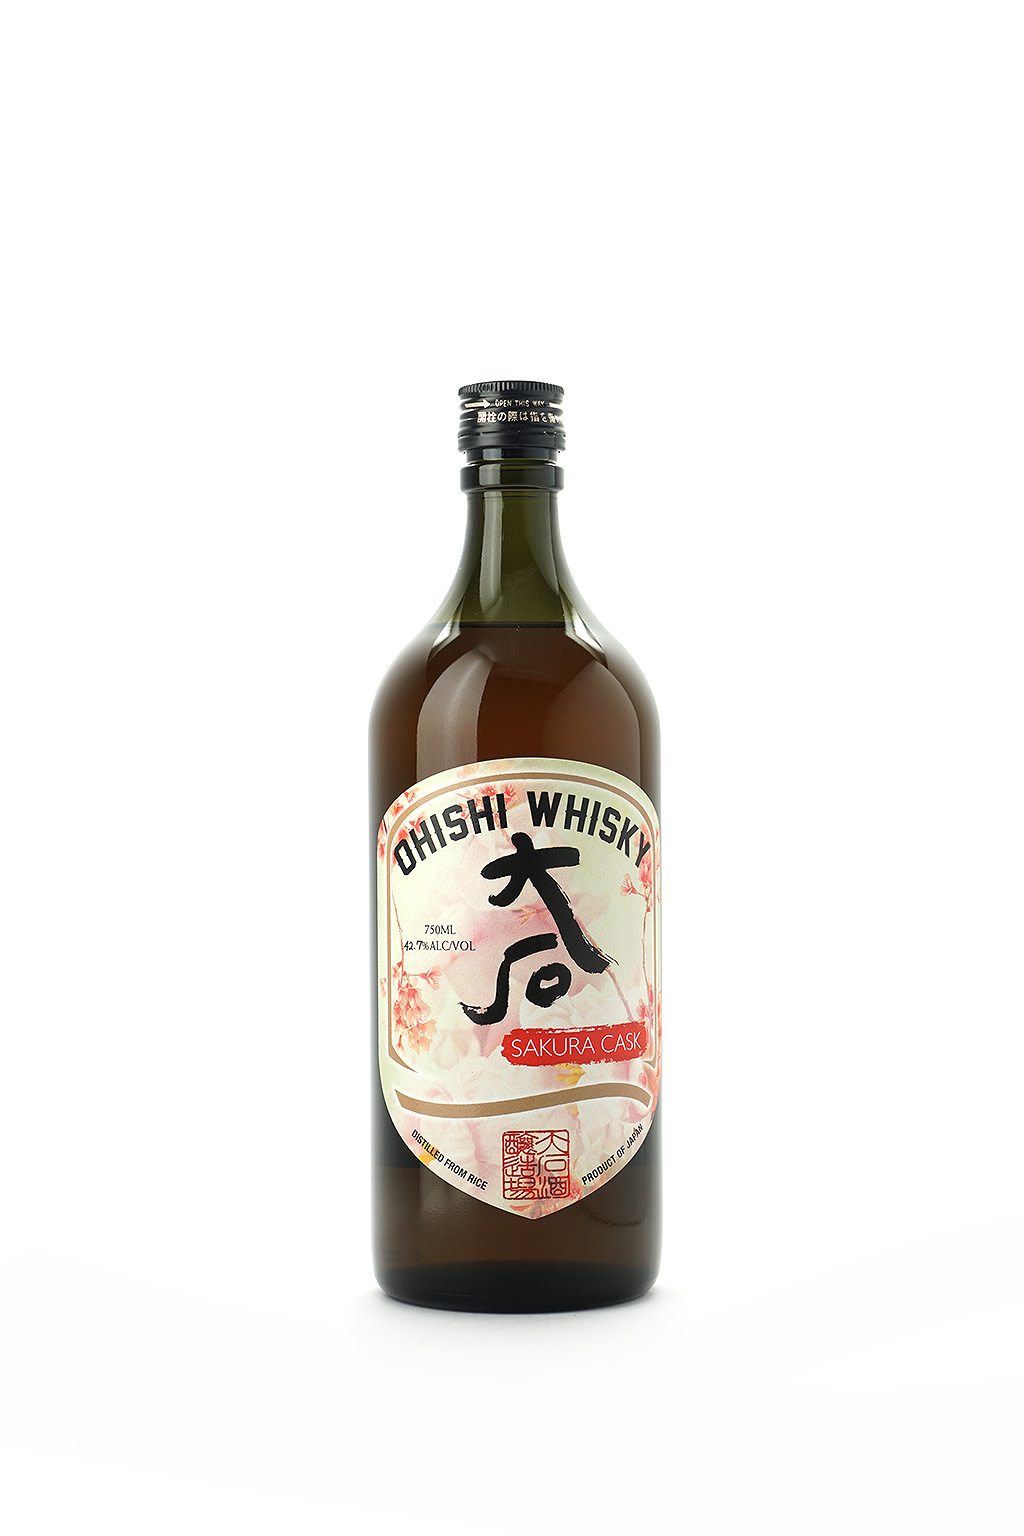 Ohishi Whisky Sakura Cask 750ml